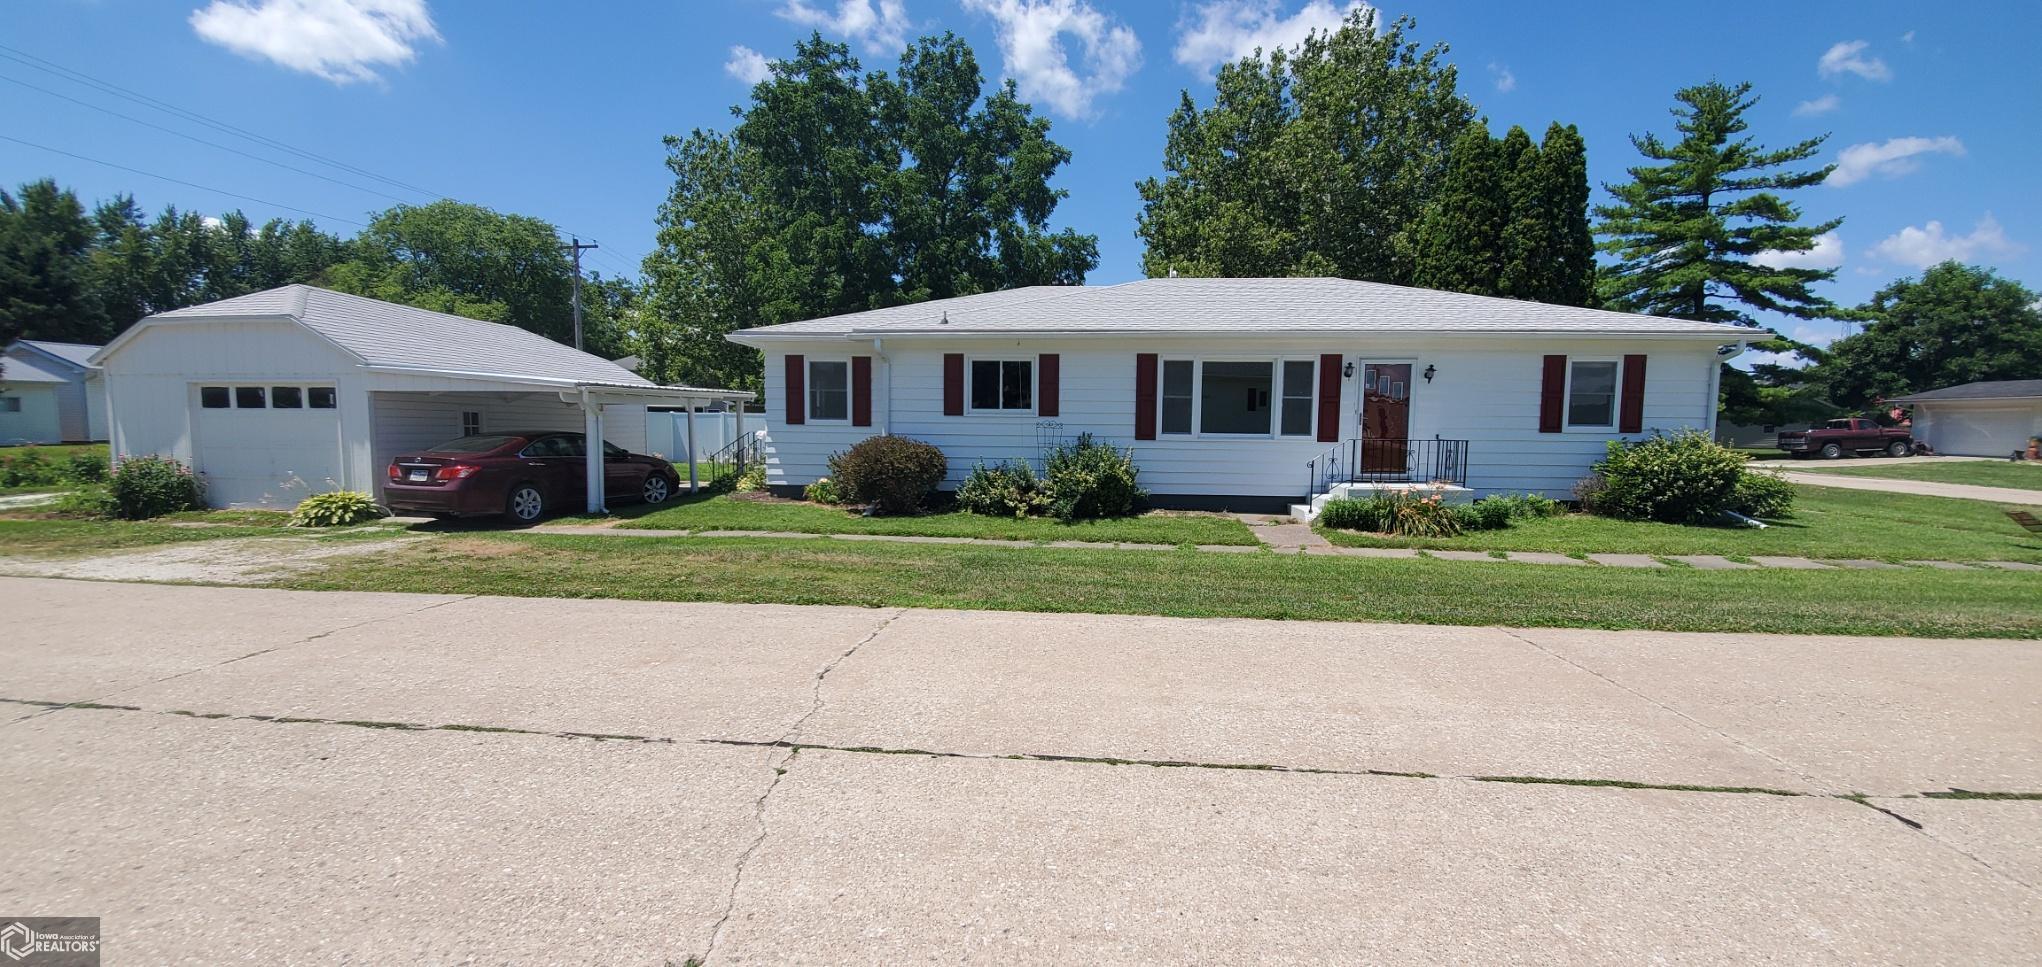 52637 Real Estate Listings Main Image